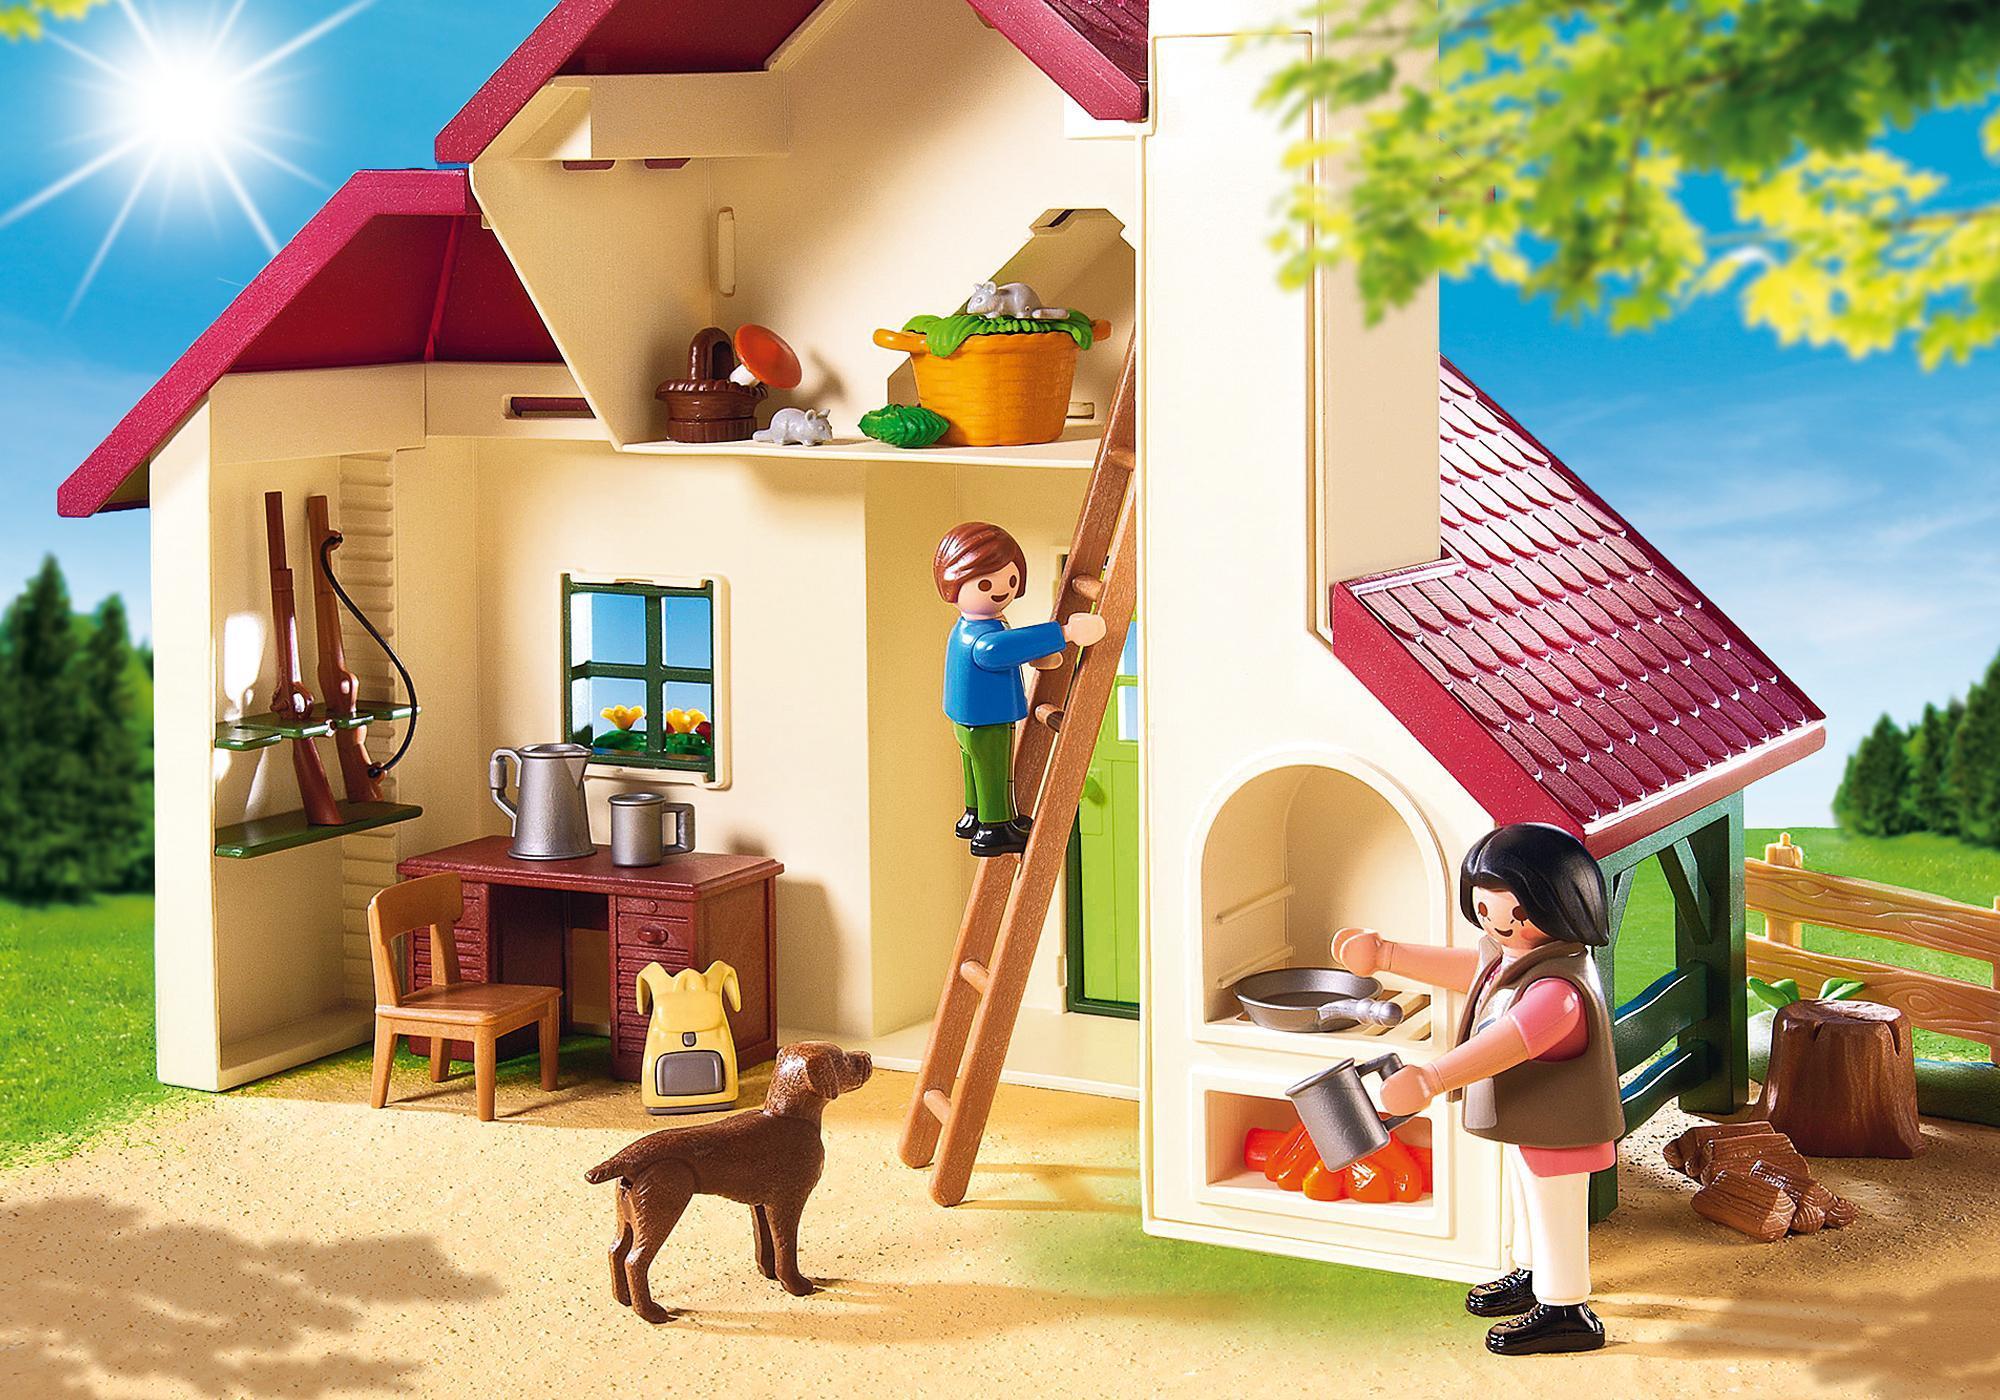 http://media.playmobil.com/i/playmobil/6811_product_extra1/Forest Ranger's House